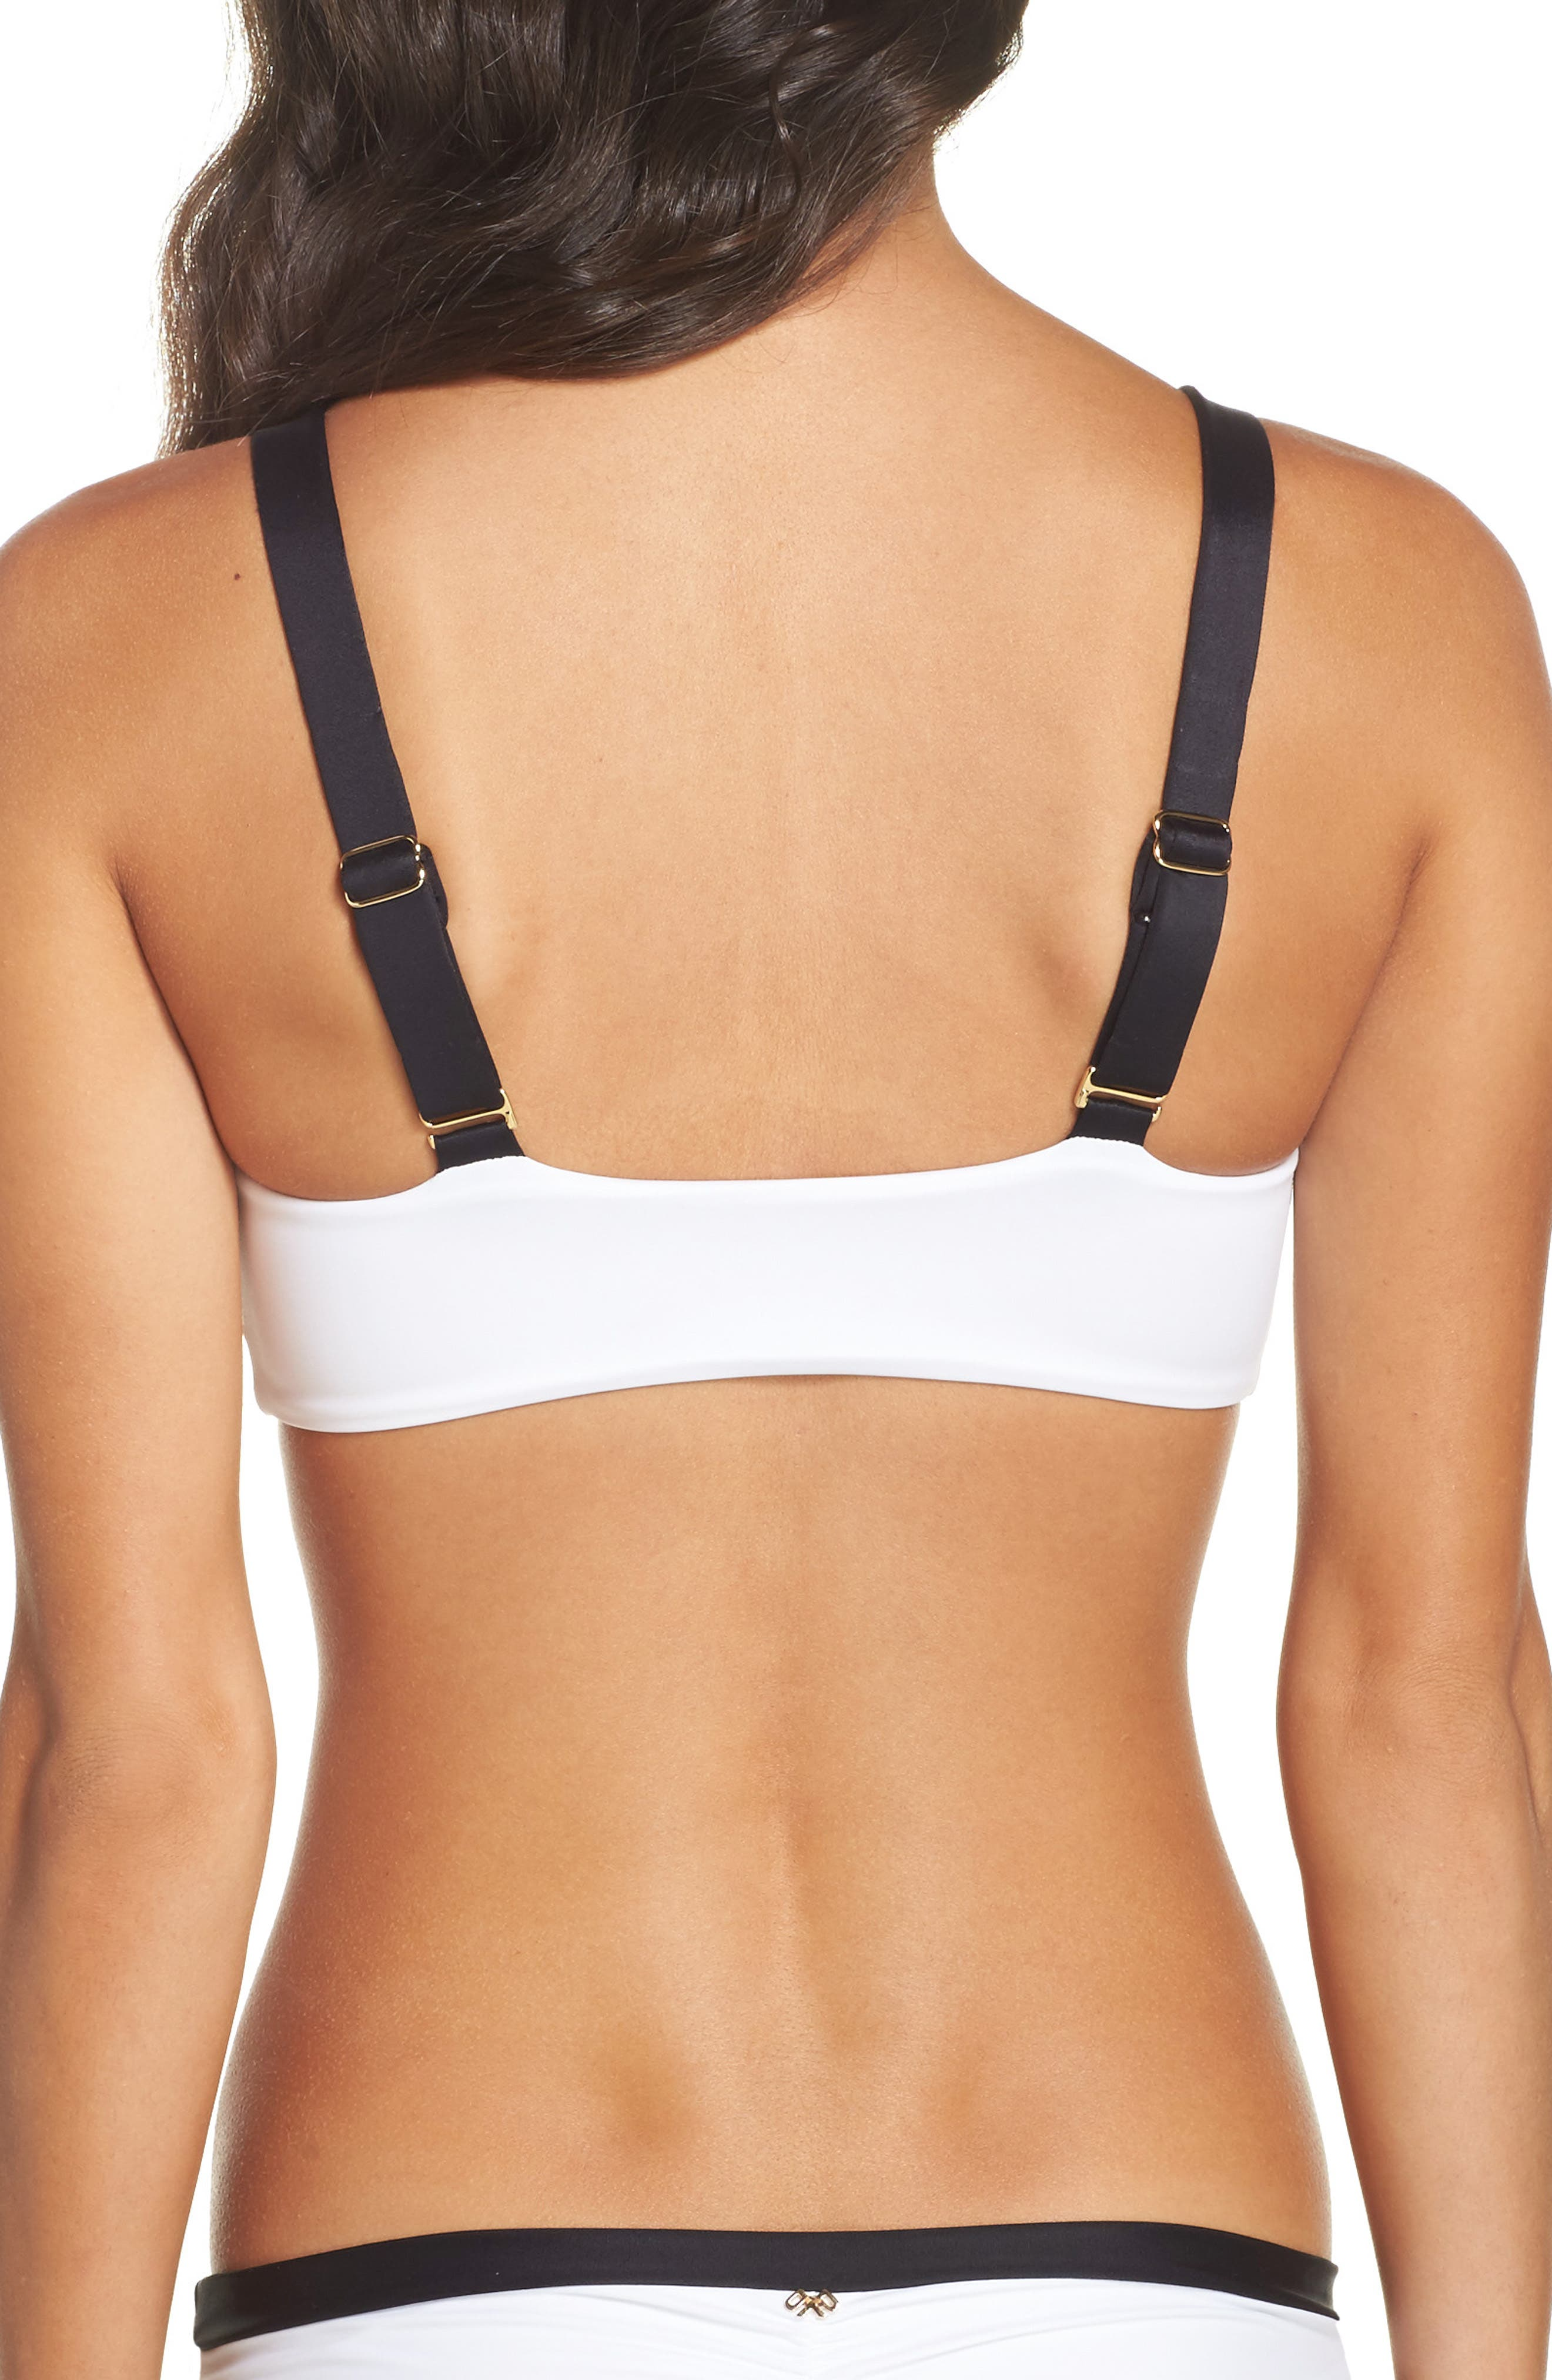 Alternate Image 2  - PilyQ Sporty Utopia Bikini Top